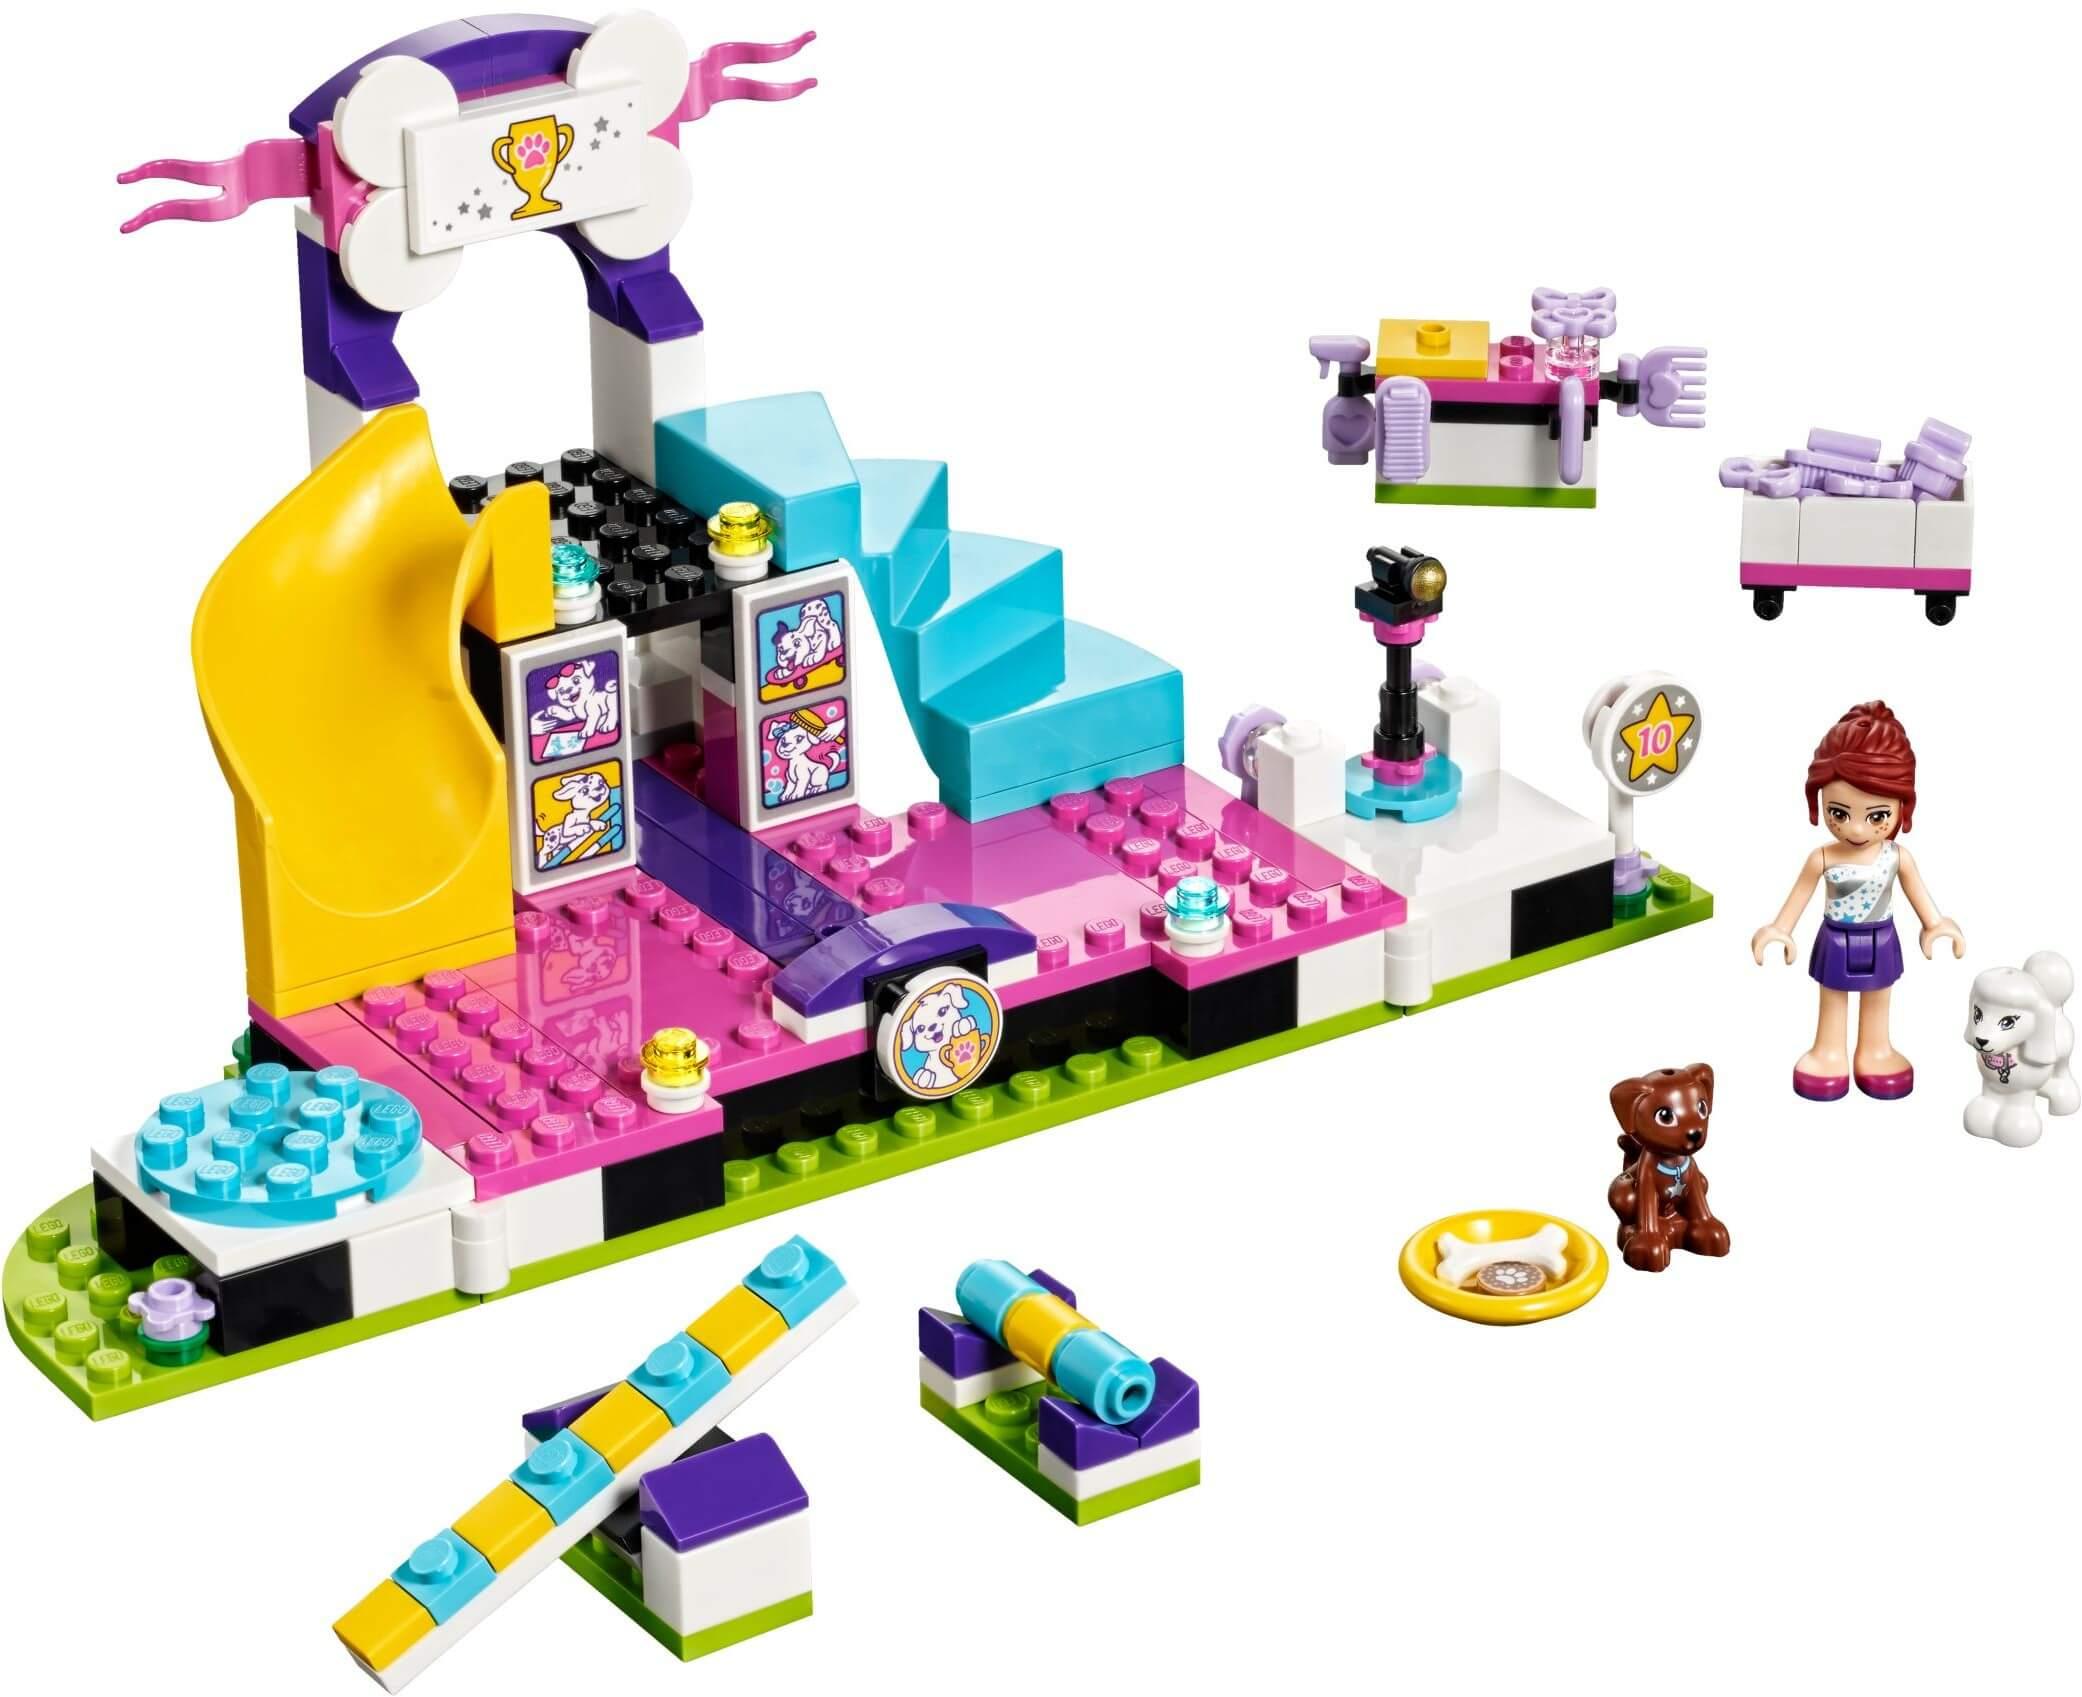 Mua đồ chơi LEGO 41300 - LEGO Friends 41300 - Cuộc Thi Thú Cưng (LEGO 41300 Puppy Championship)